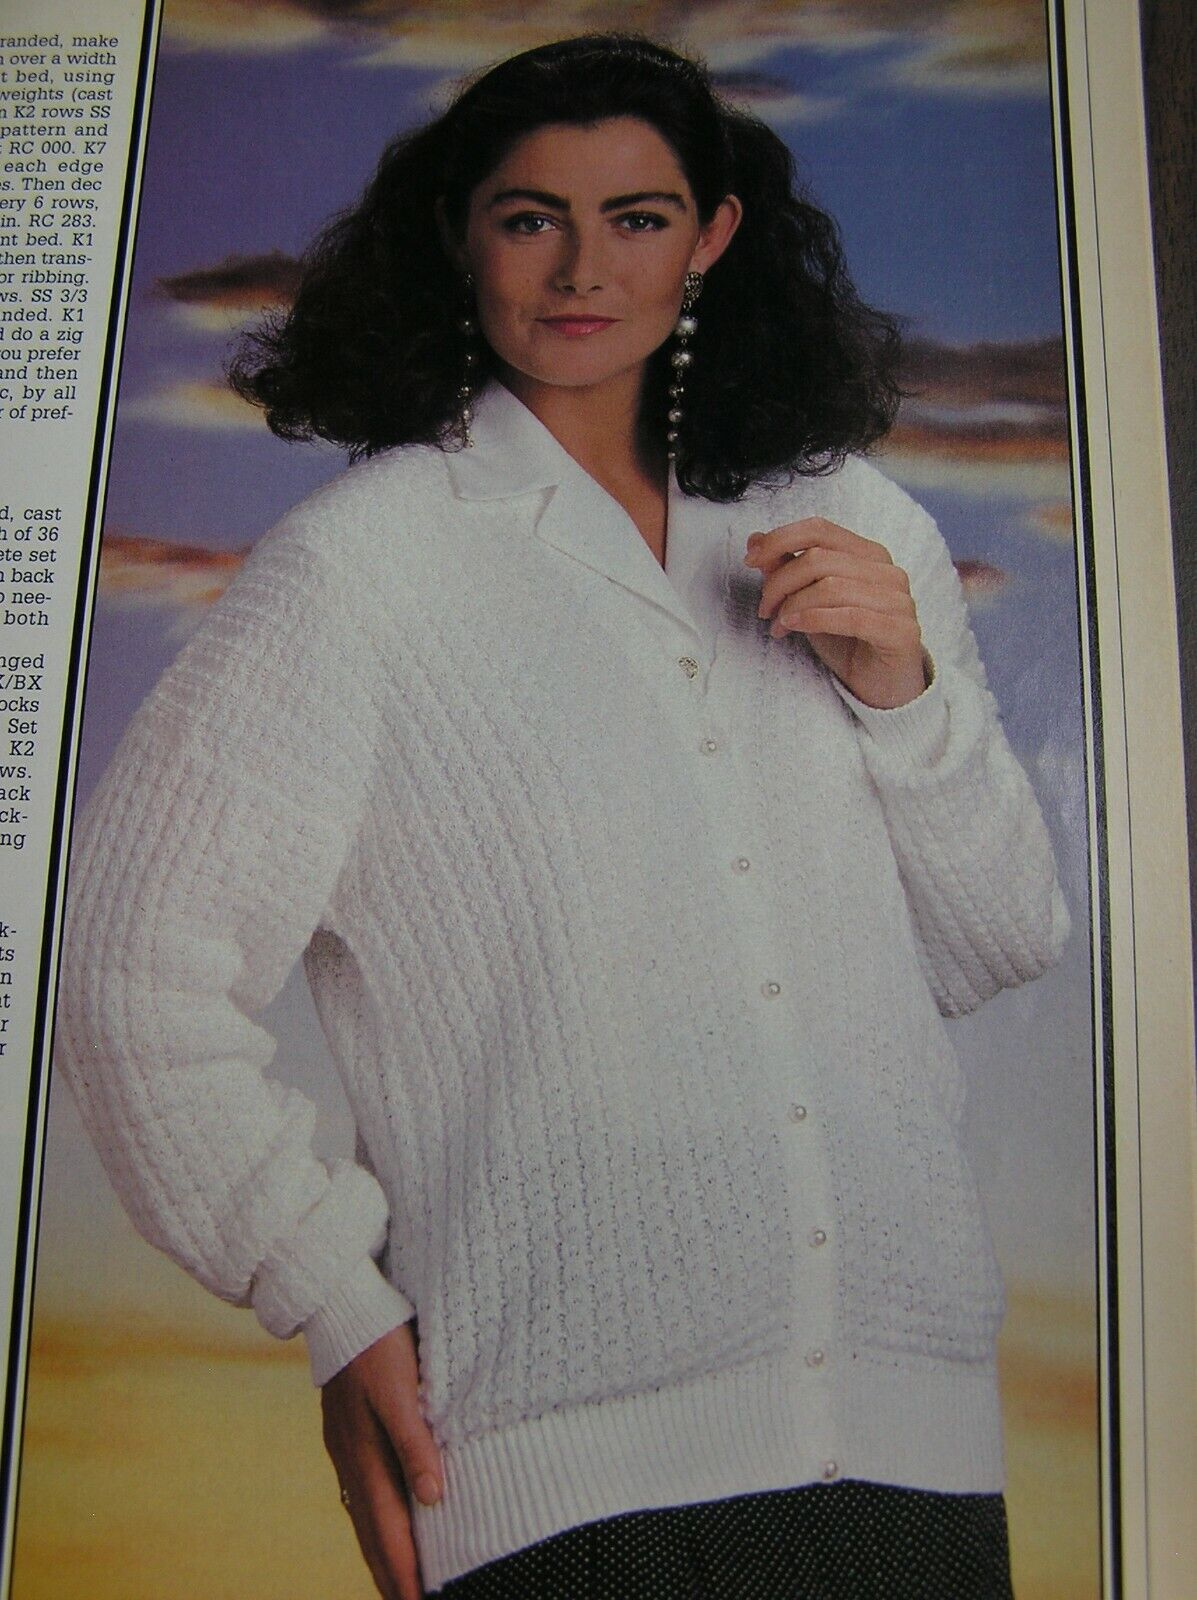 Machine Knit America November/December 1992 Vol 2 No 3 - $5.95